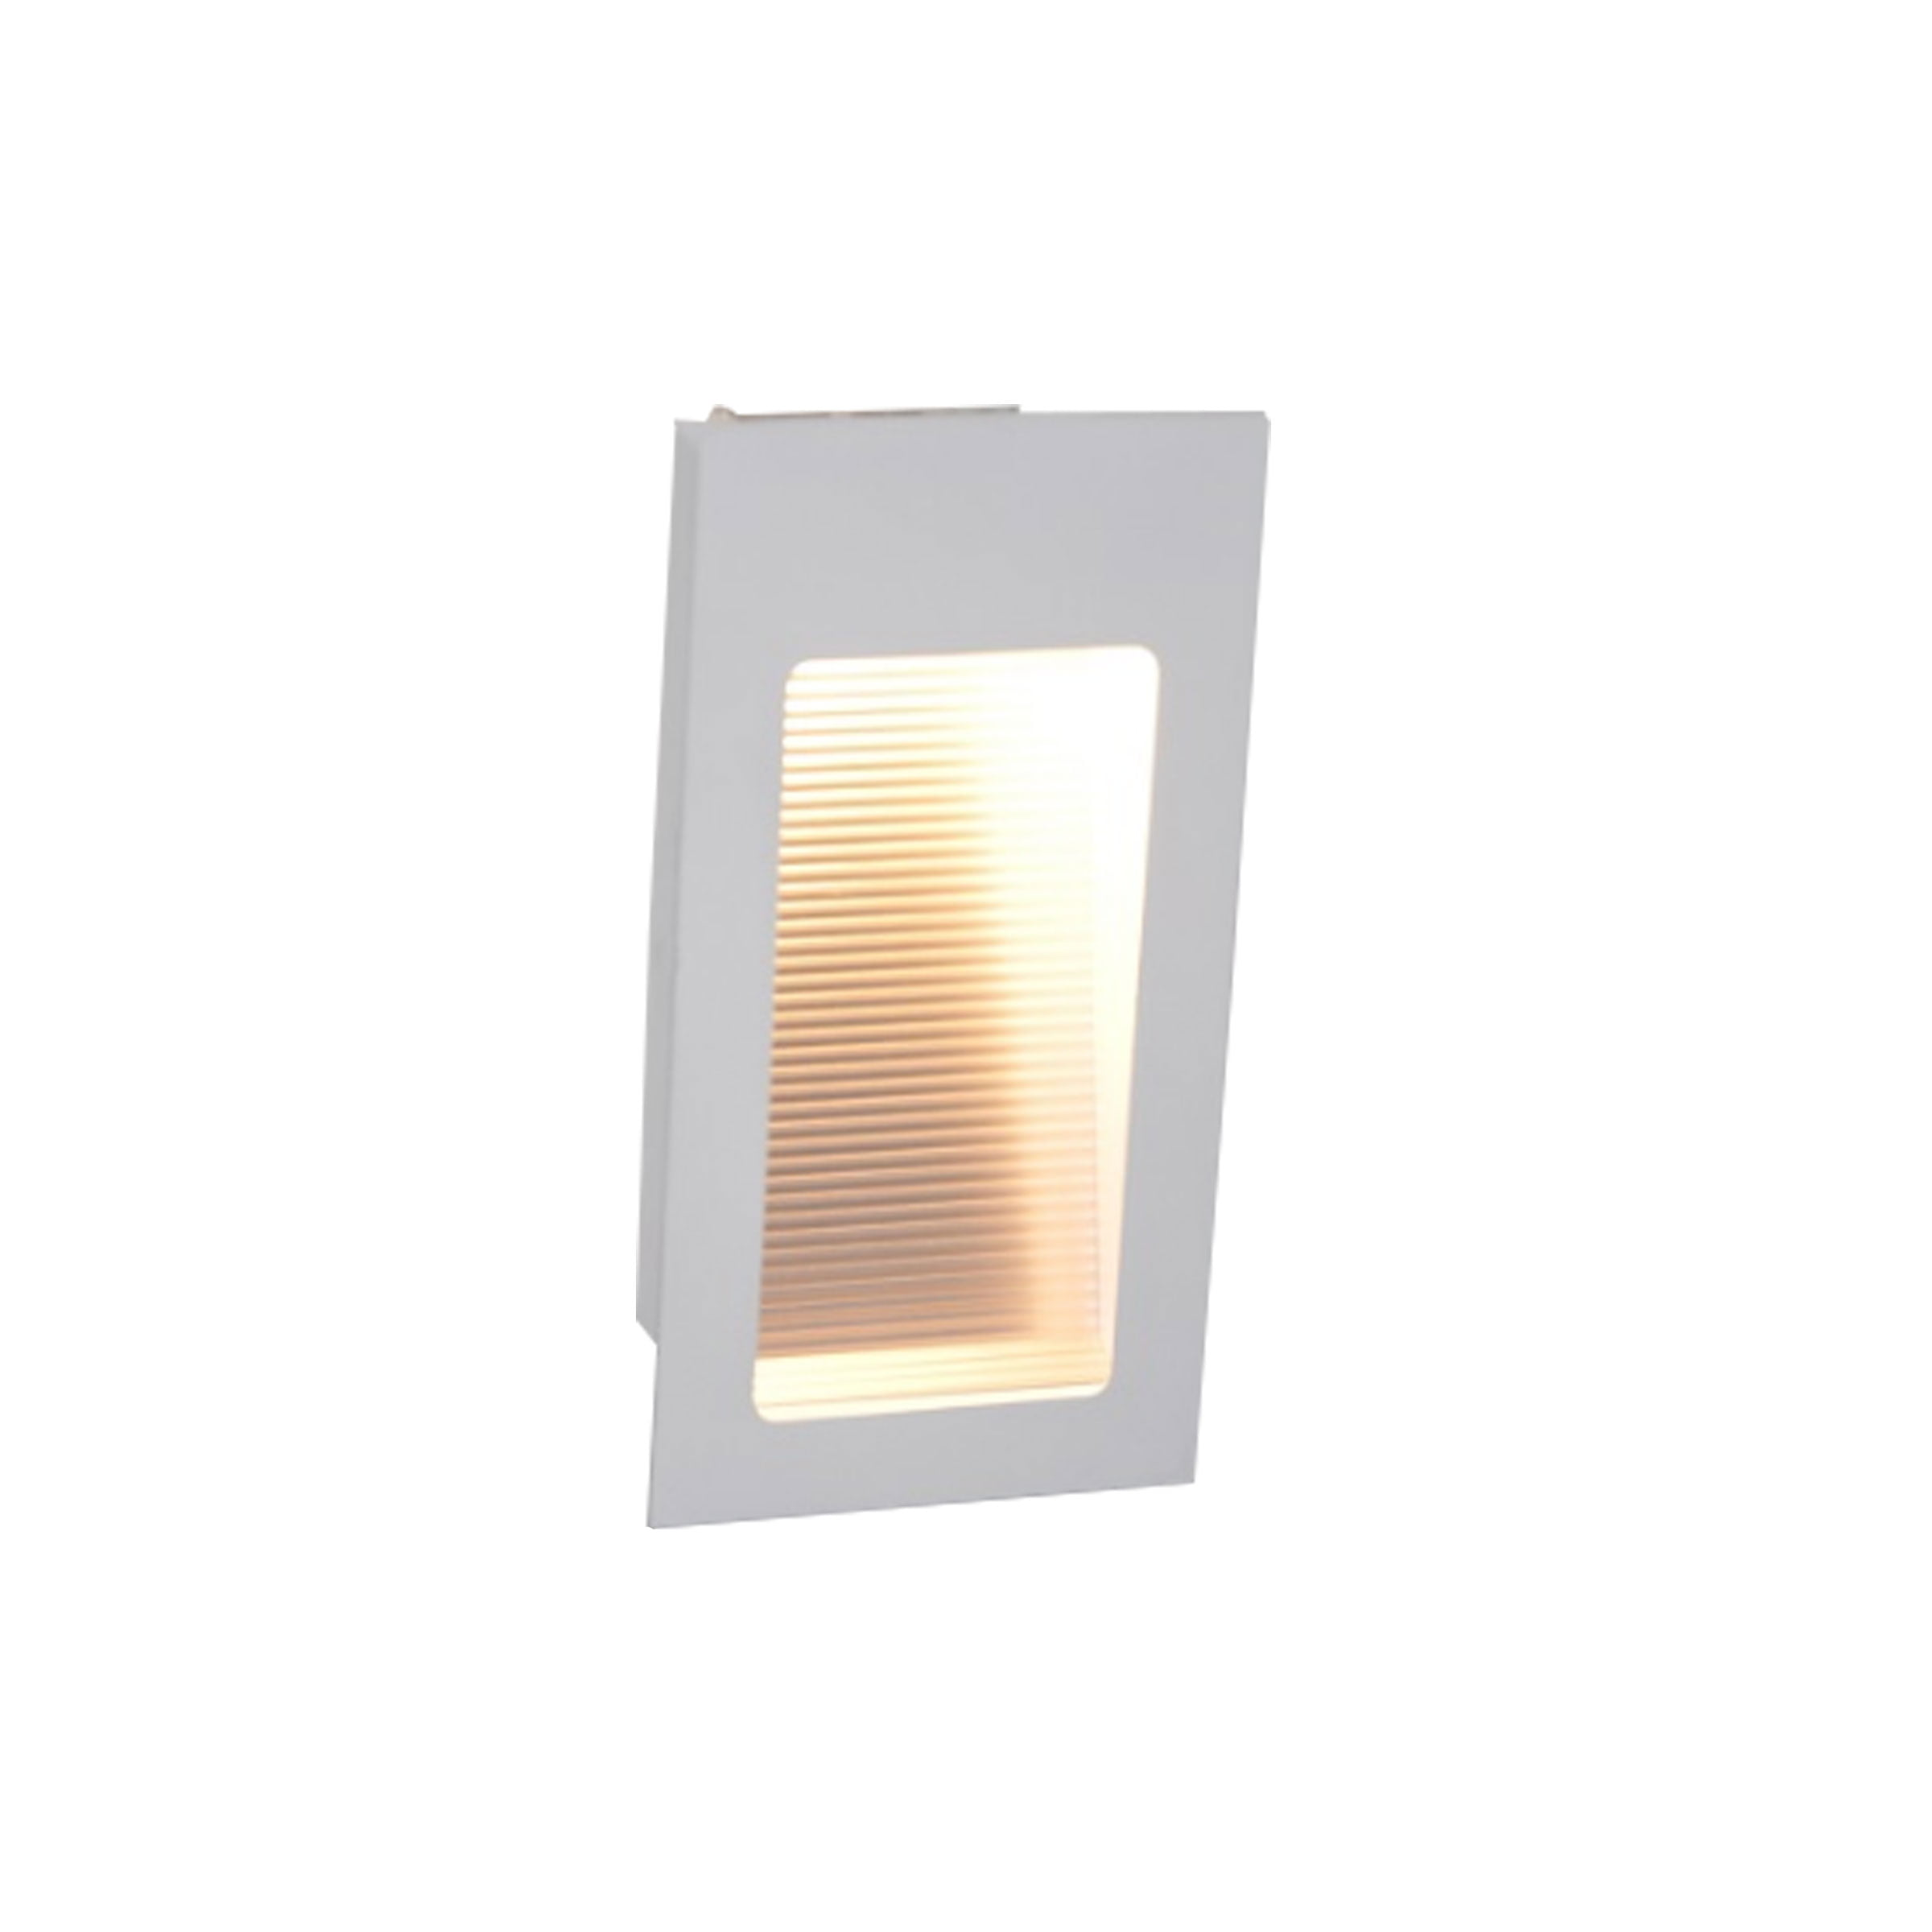 BALIZADOR EMBUTIR INCLINADO 180 X 95mm PARA UMA LAMPADA G9/HALOPIN